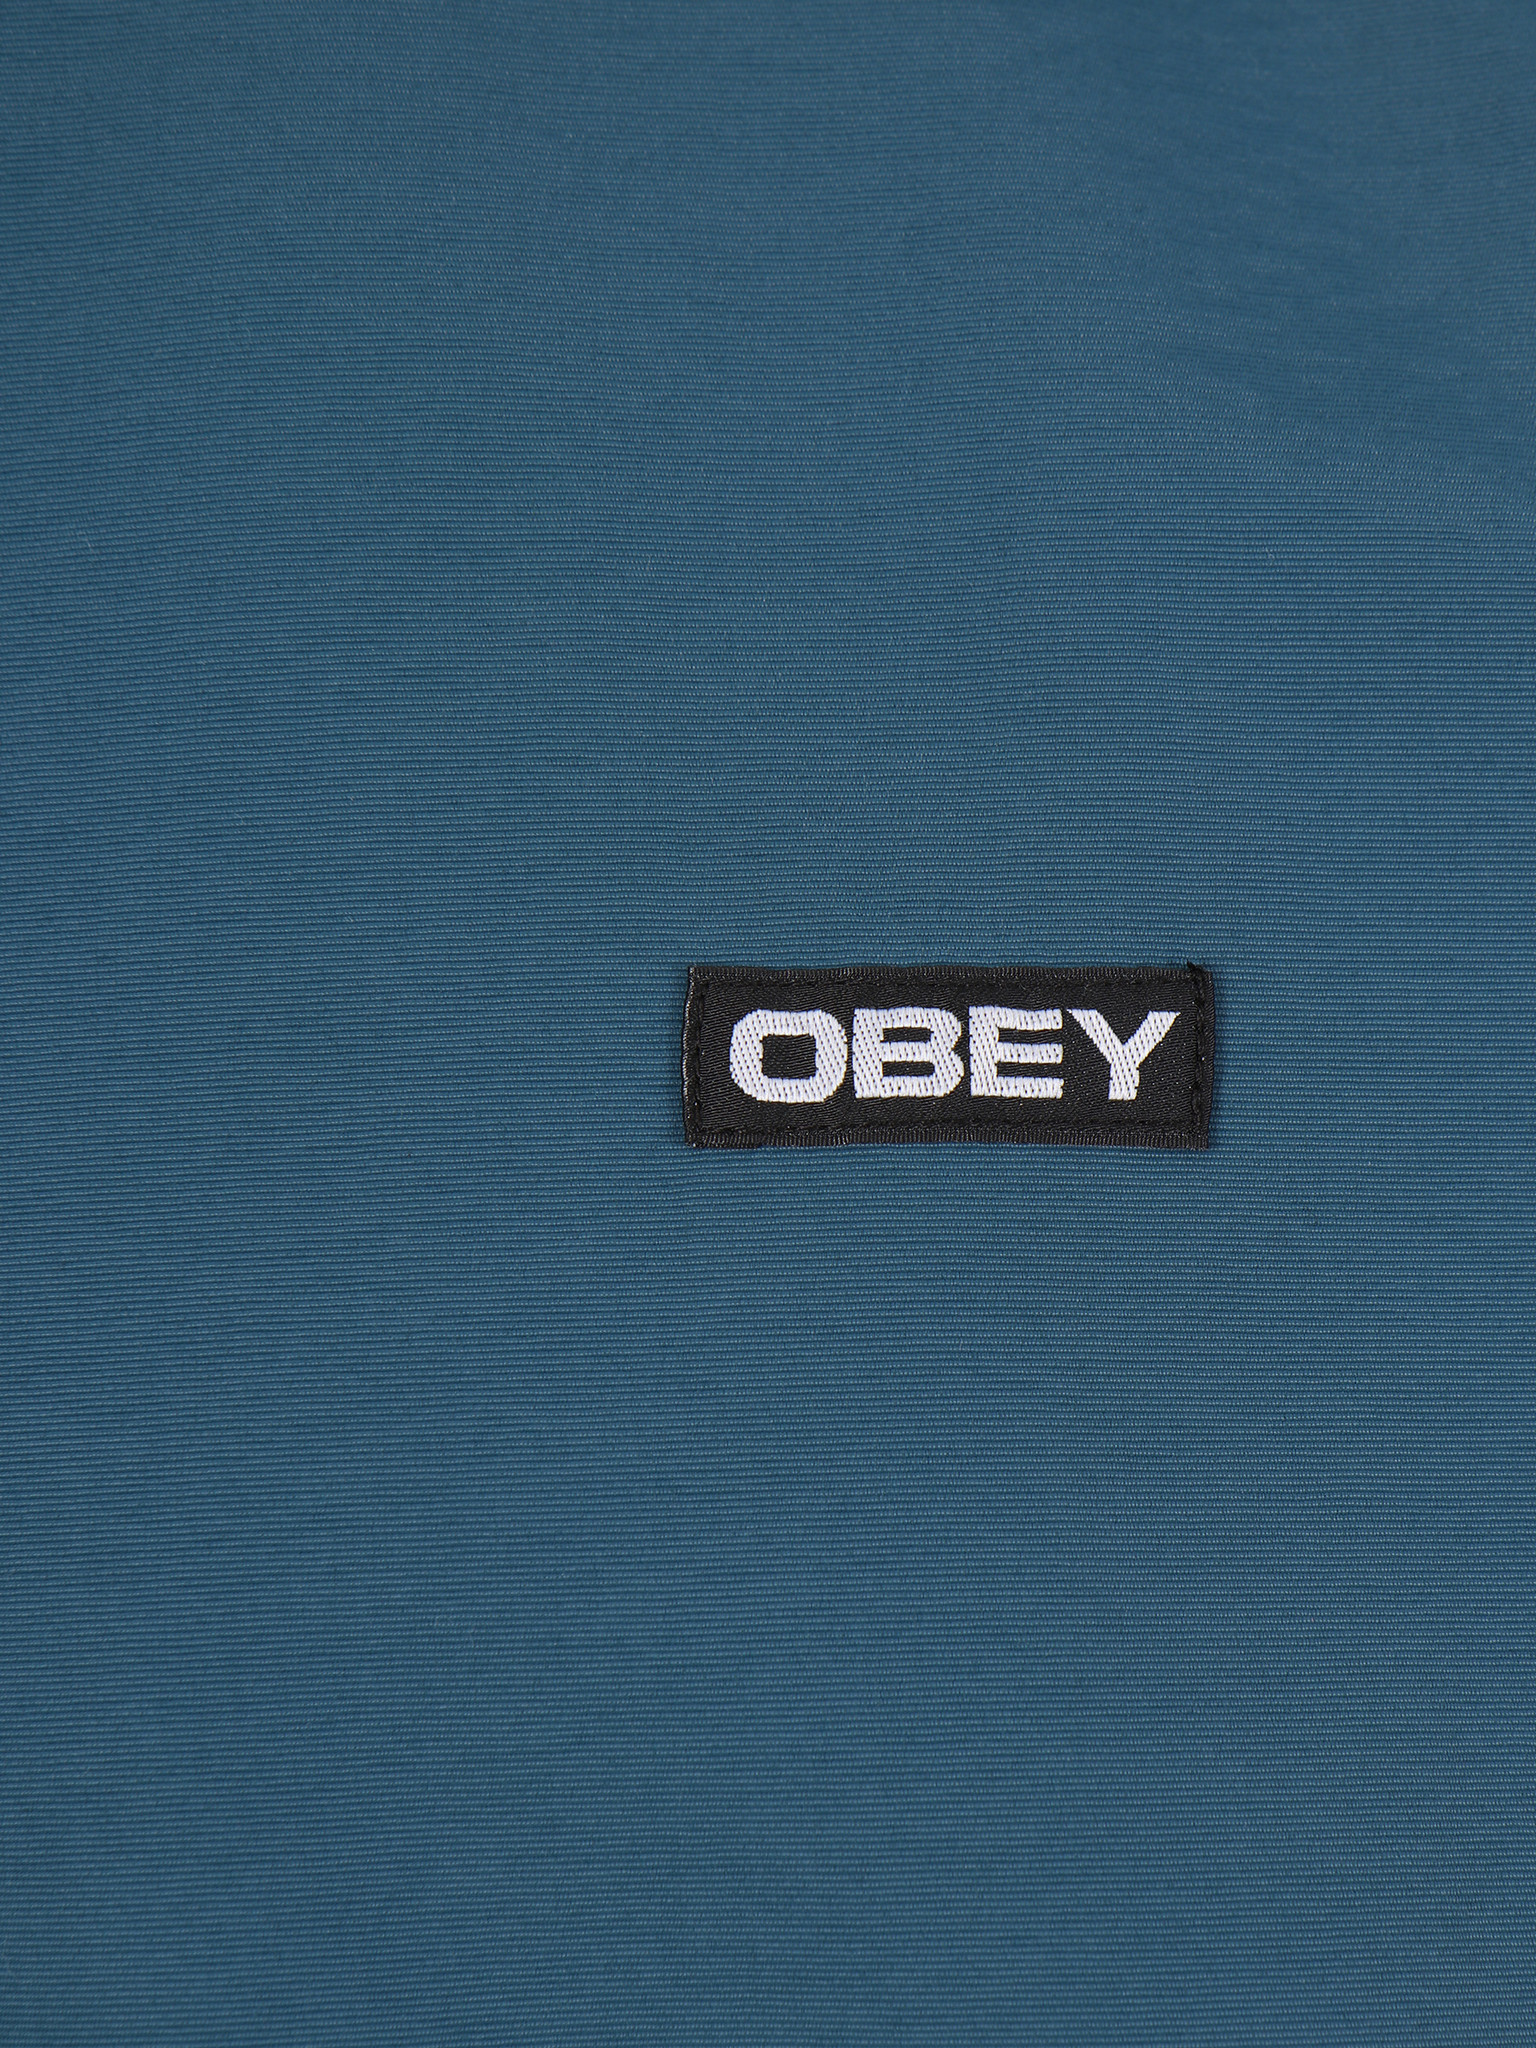 Obey Obey The tucker anorak Sapphire multi 121800408 SAP